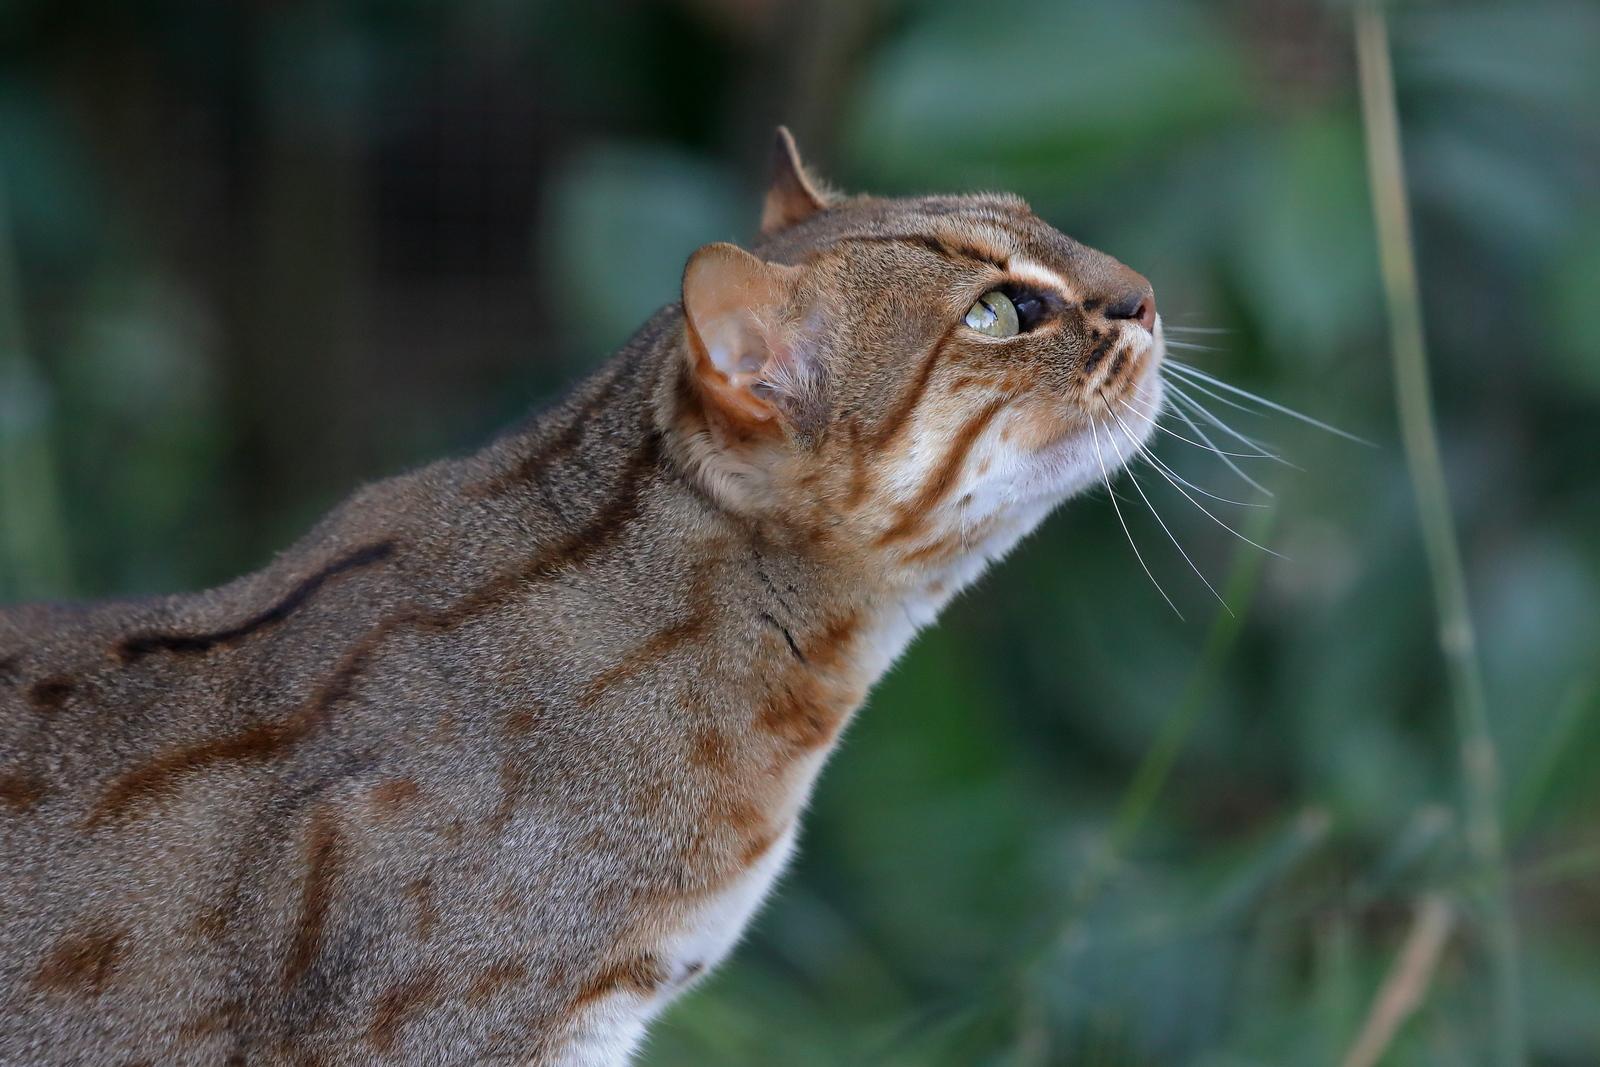 IMAGE: https://photos.smugmug.com/Earths-Other-Residents/Big-Cats/i-gqBB6Pj/0/410ae274/X3/00021624-X3.jpg